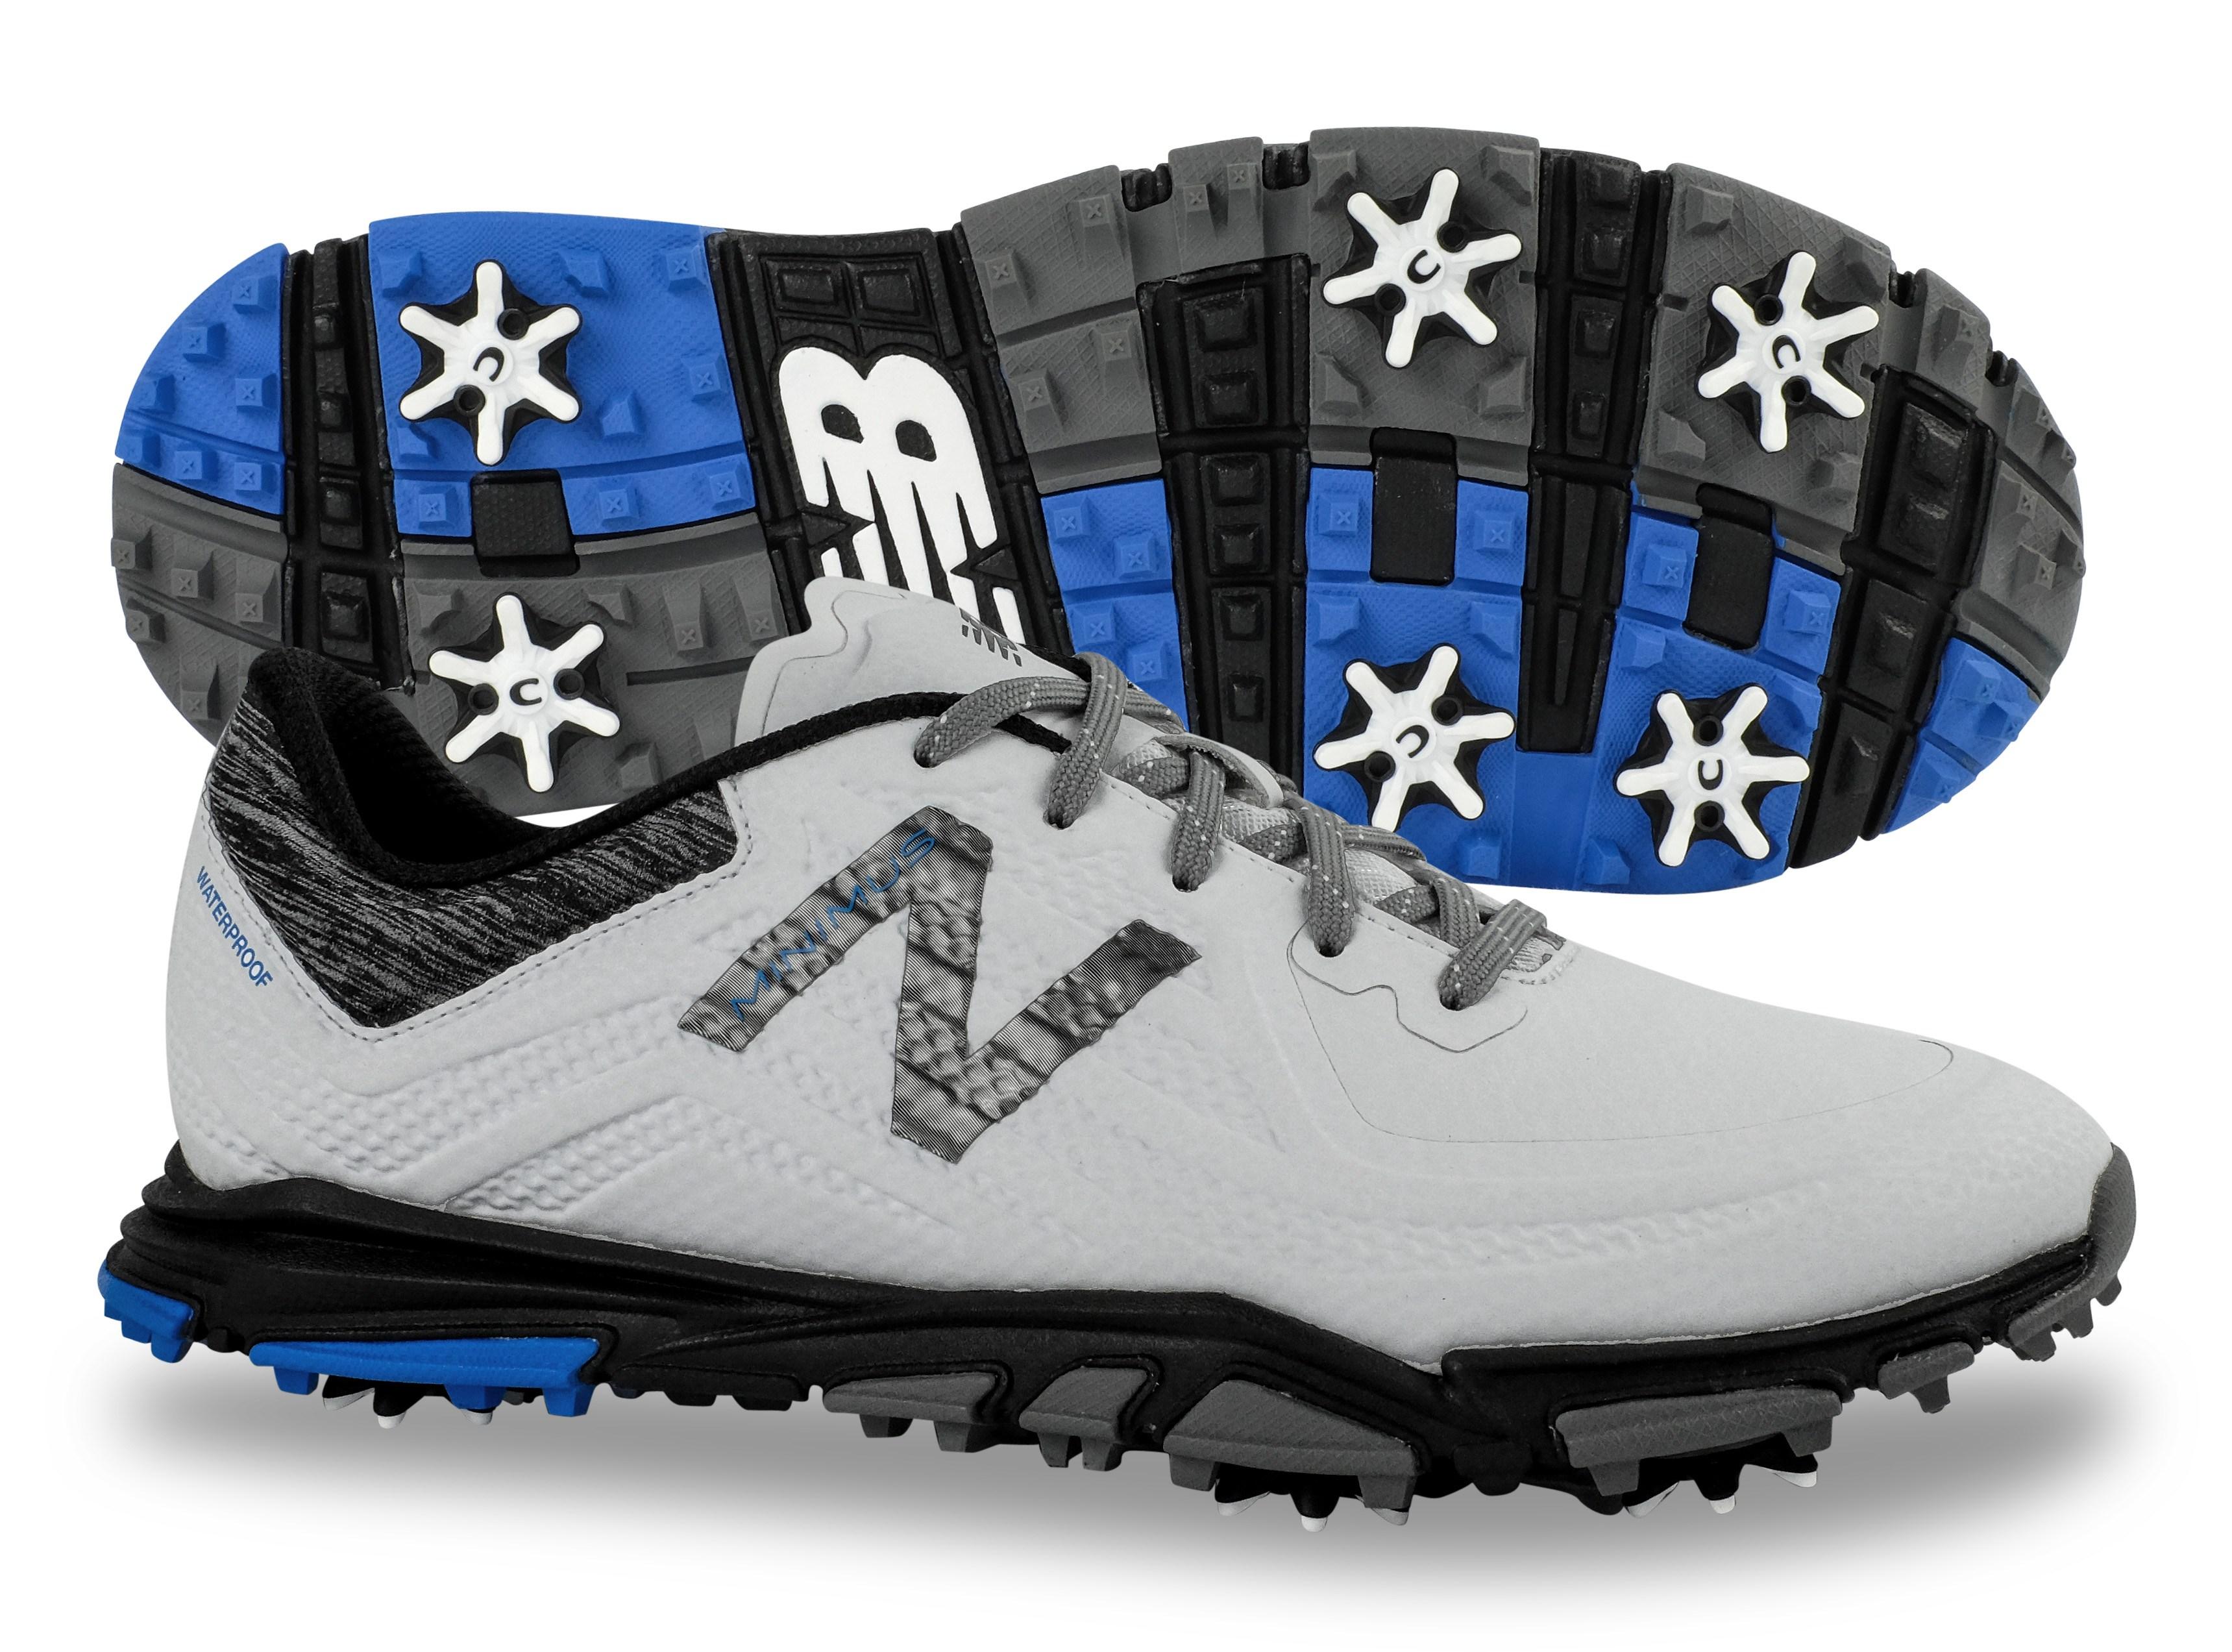 New Balance Golf- NBG1007 Minimus Tour Shoes (Closeout) 3c136fa2d24